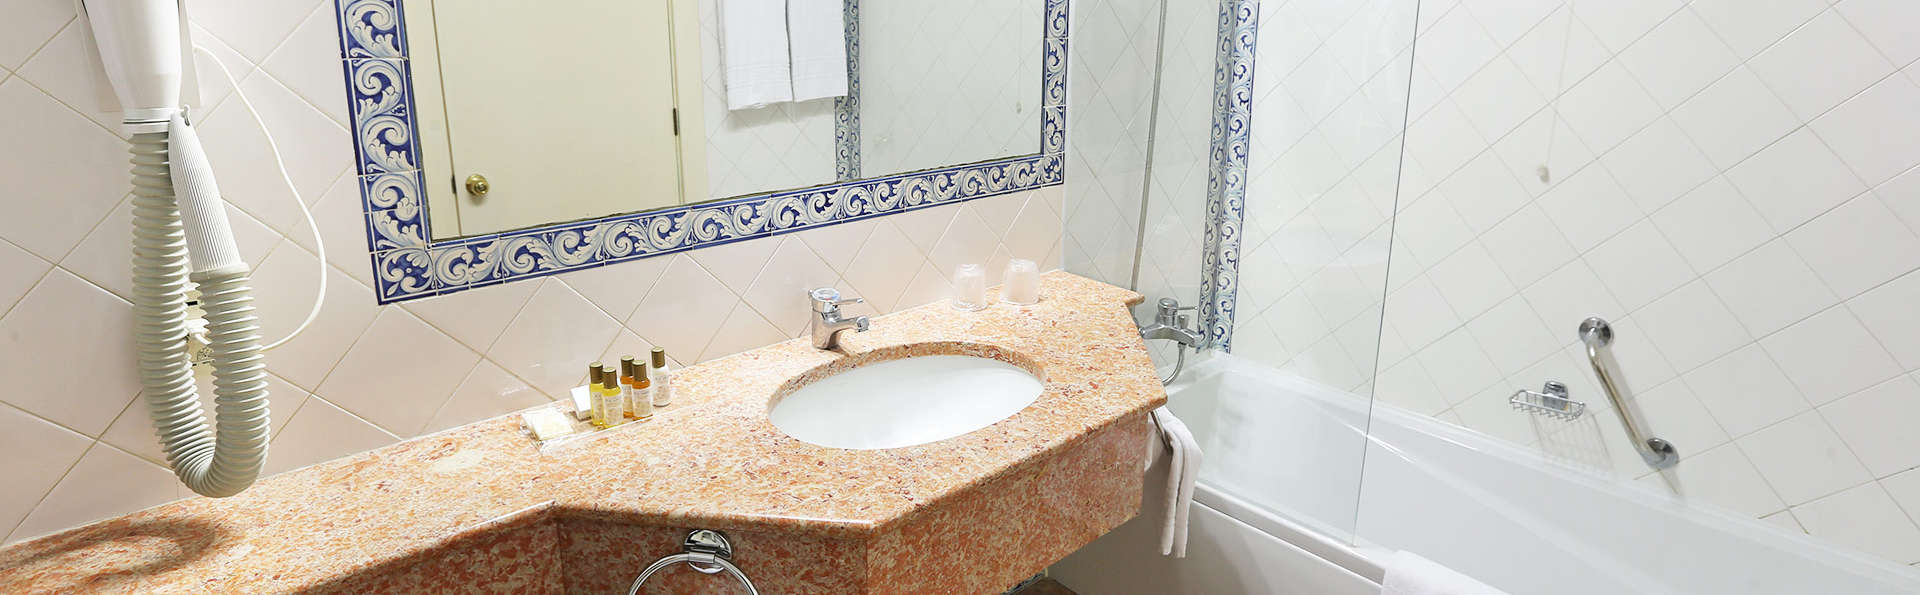 Conimbriga Hotel do Paço - EDIT_bath.jpg